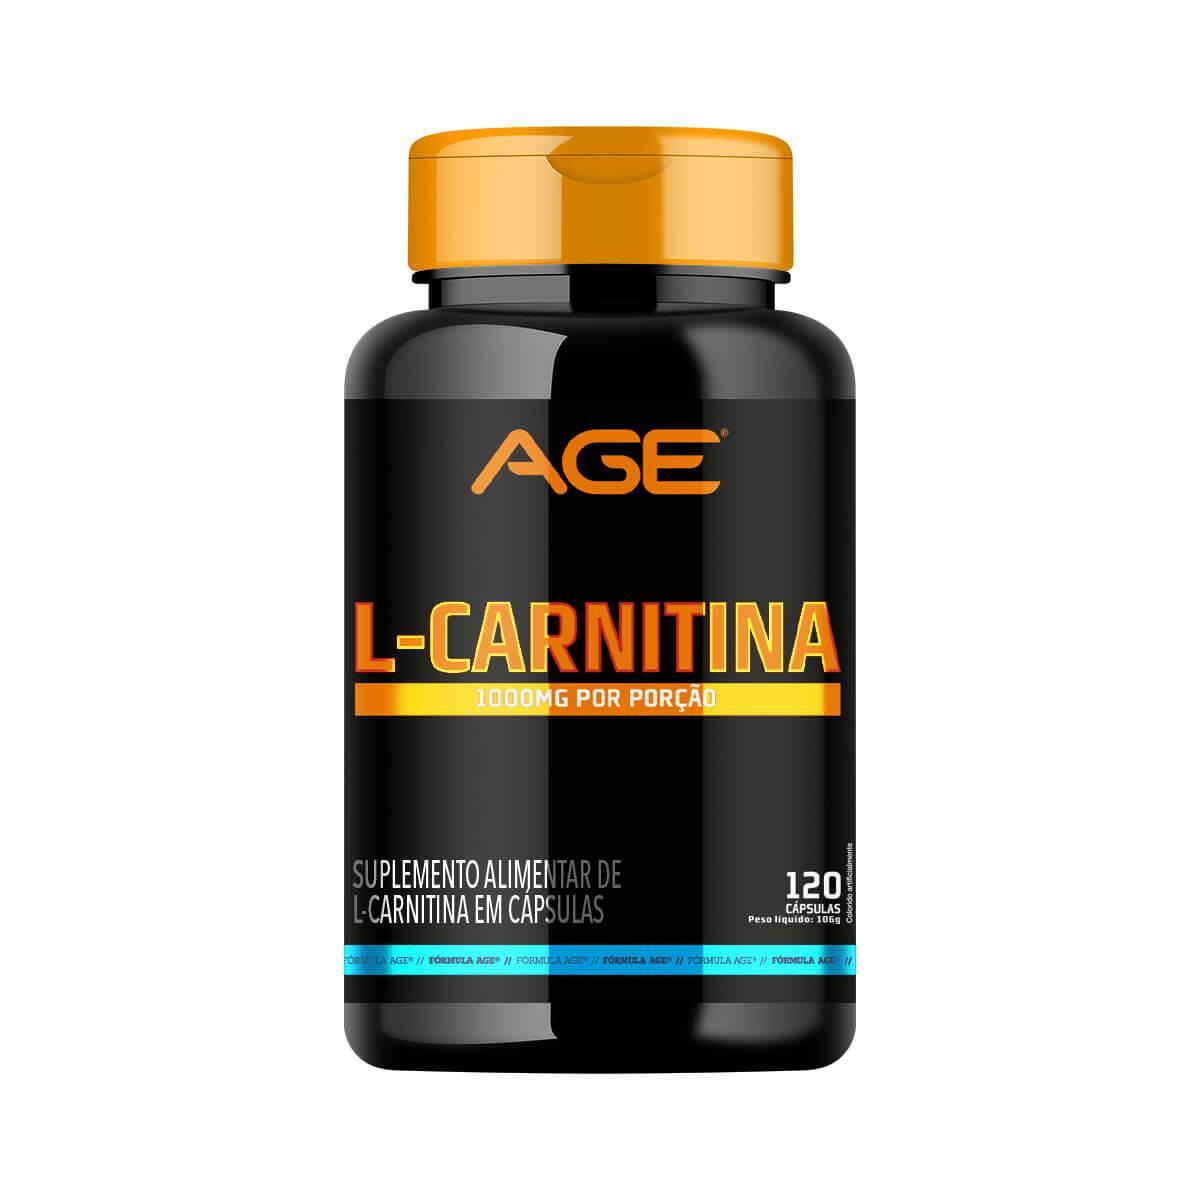 L-CARNITINA (120 Cápsulas) - AGE